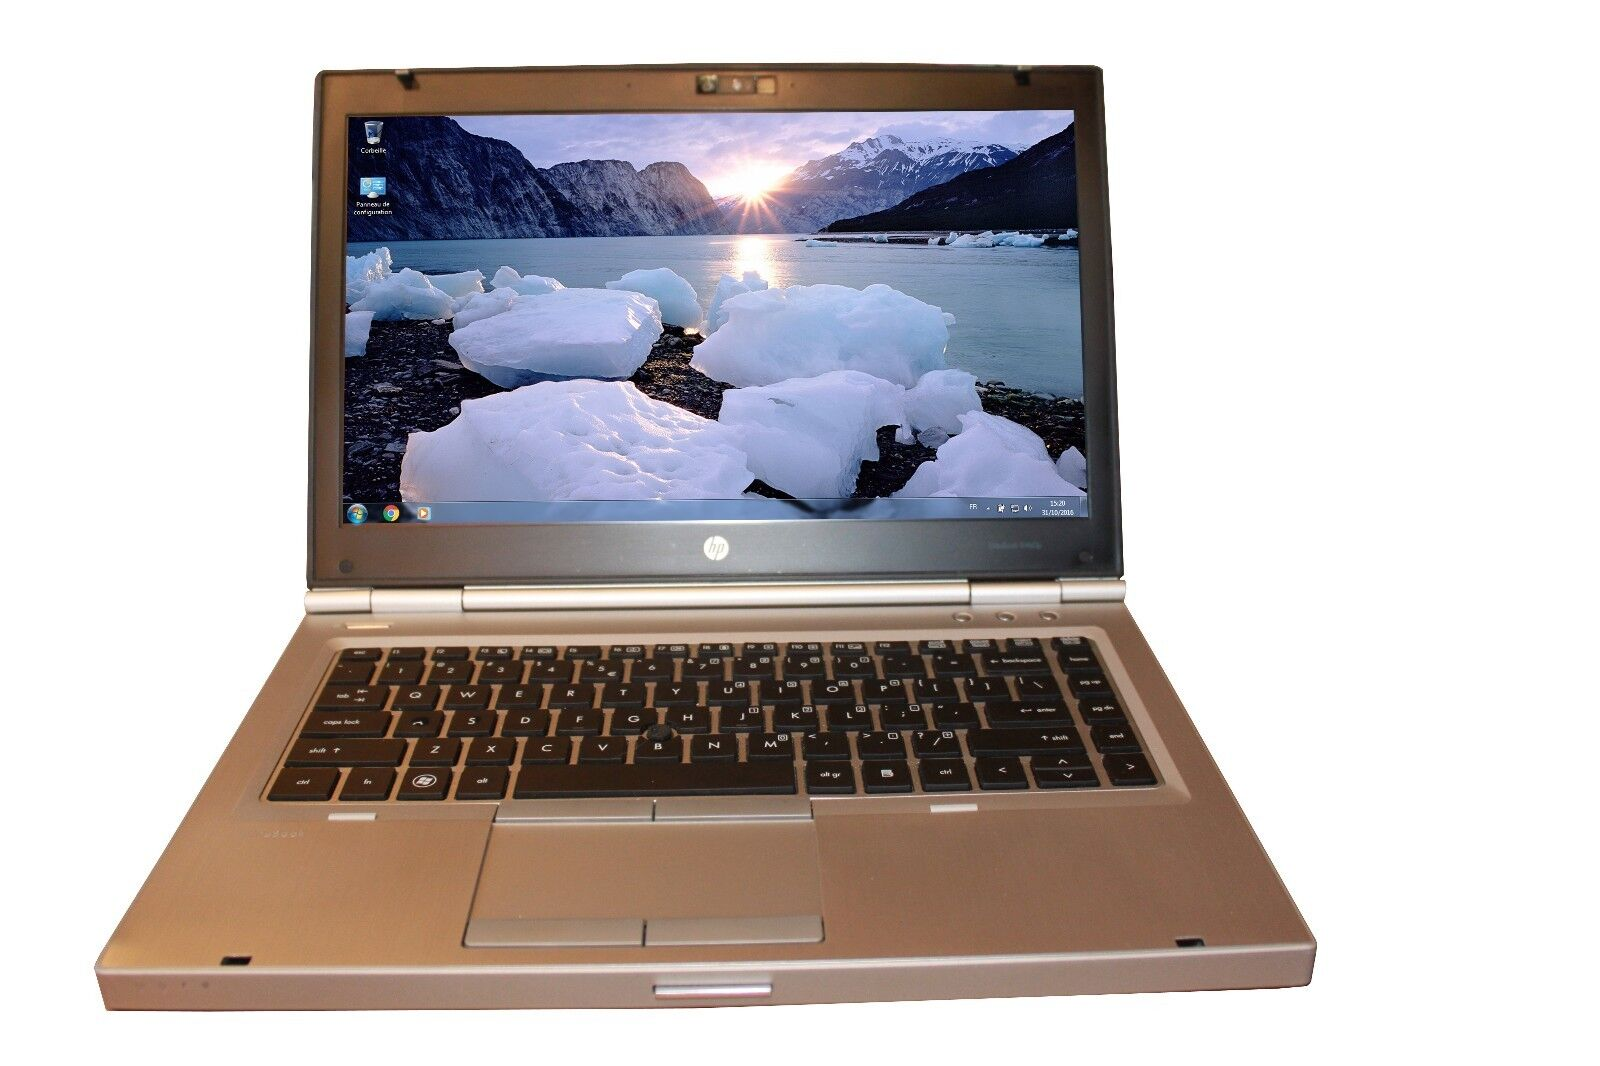 pc portable hp elitebook 8460p intel i5 disque dur. Black Bedroom Furniture Sets. Home Design Ideas